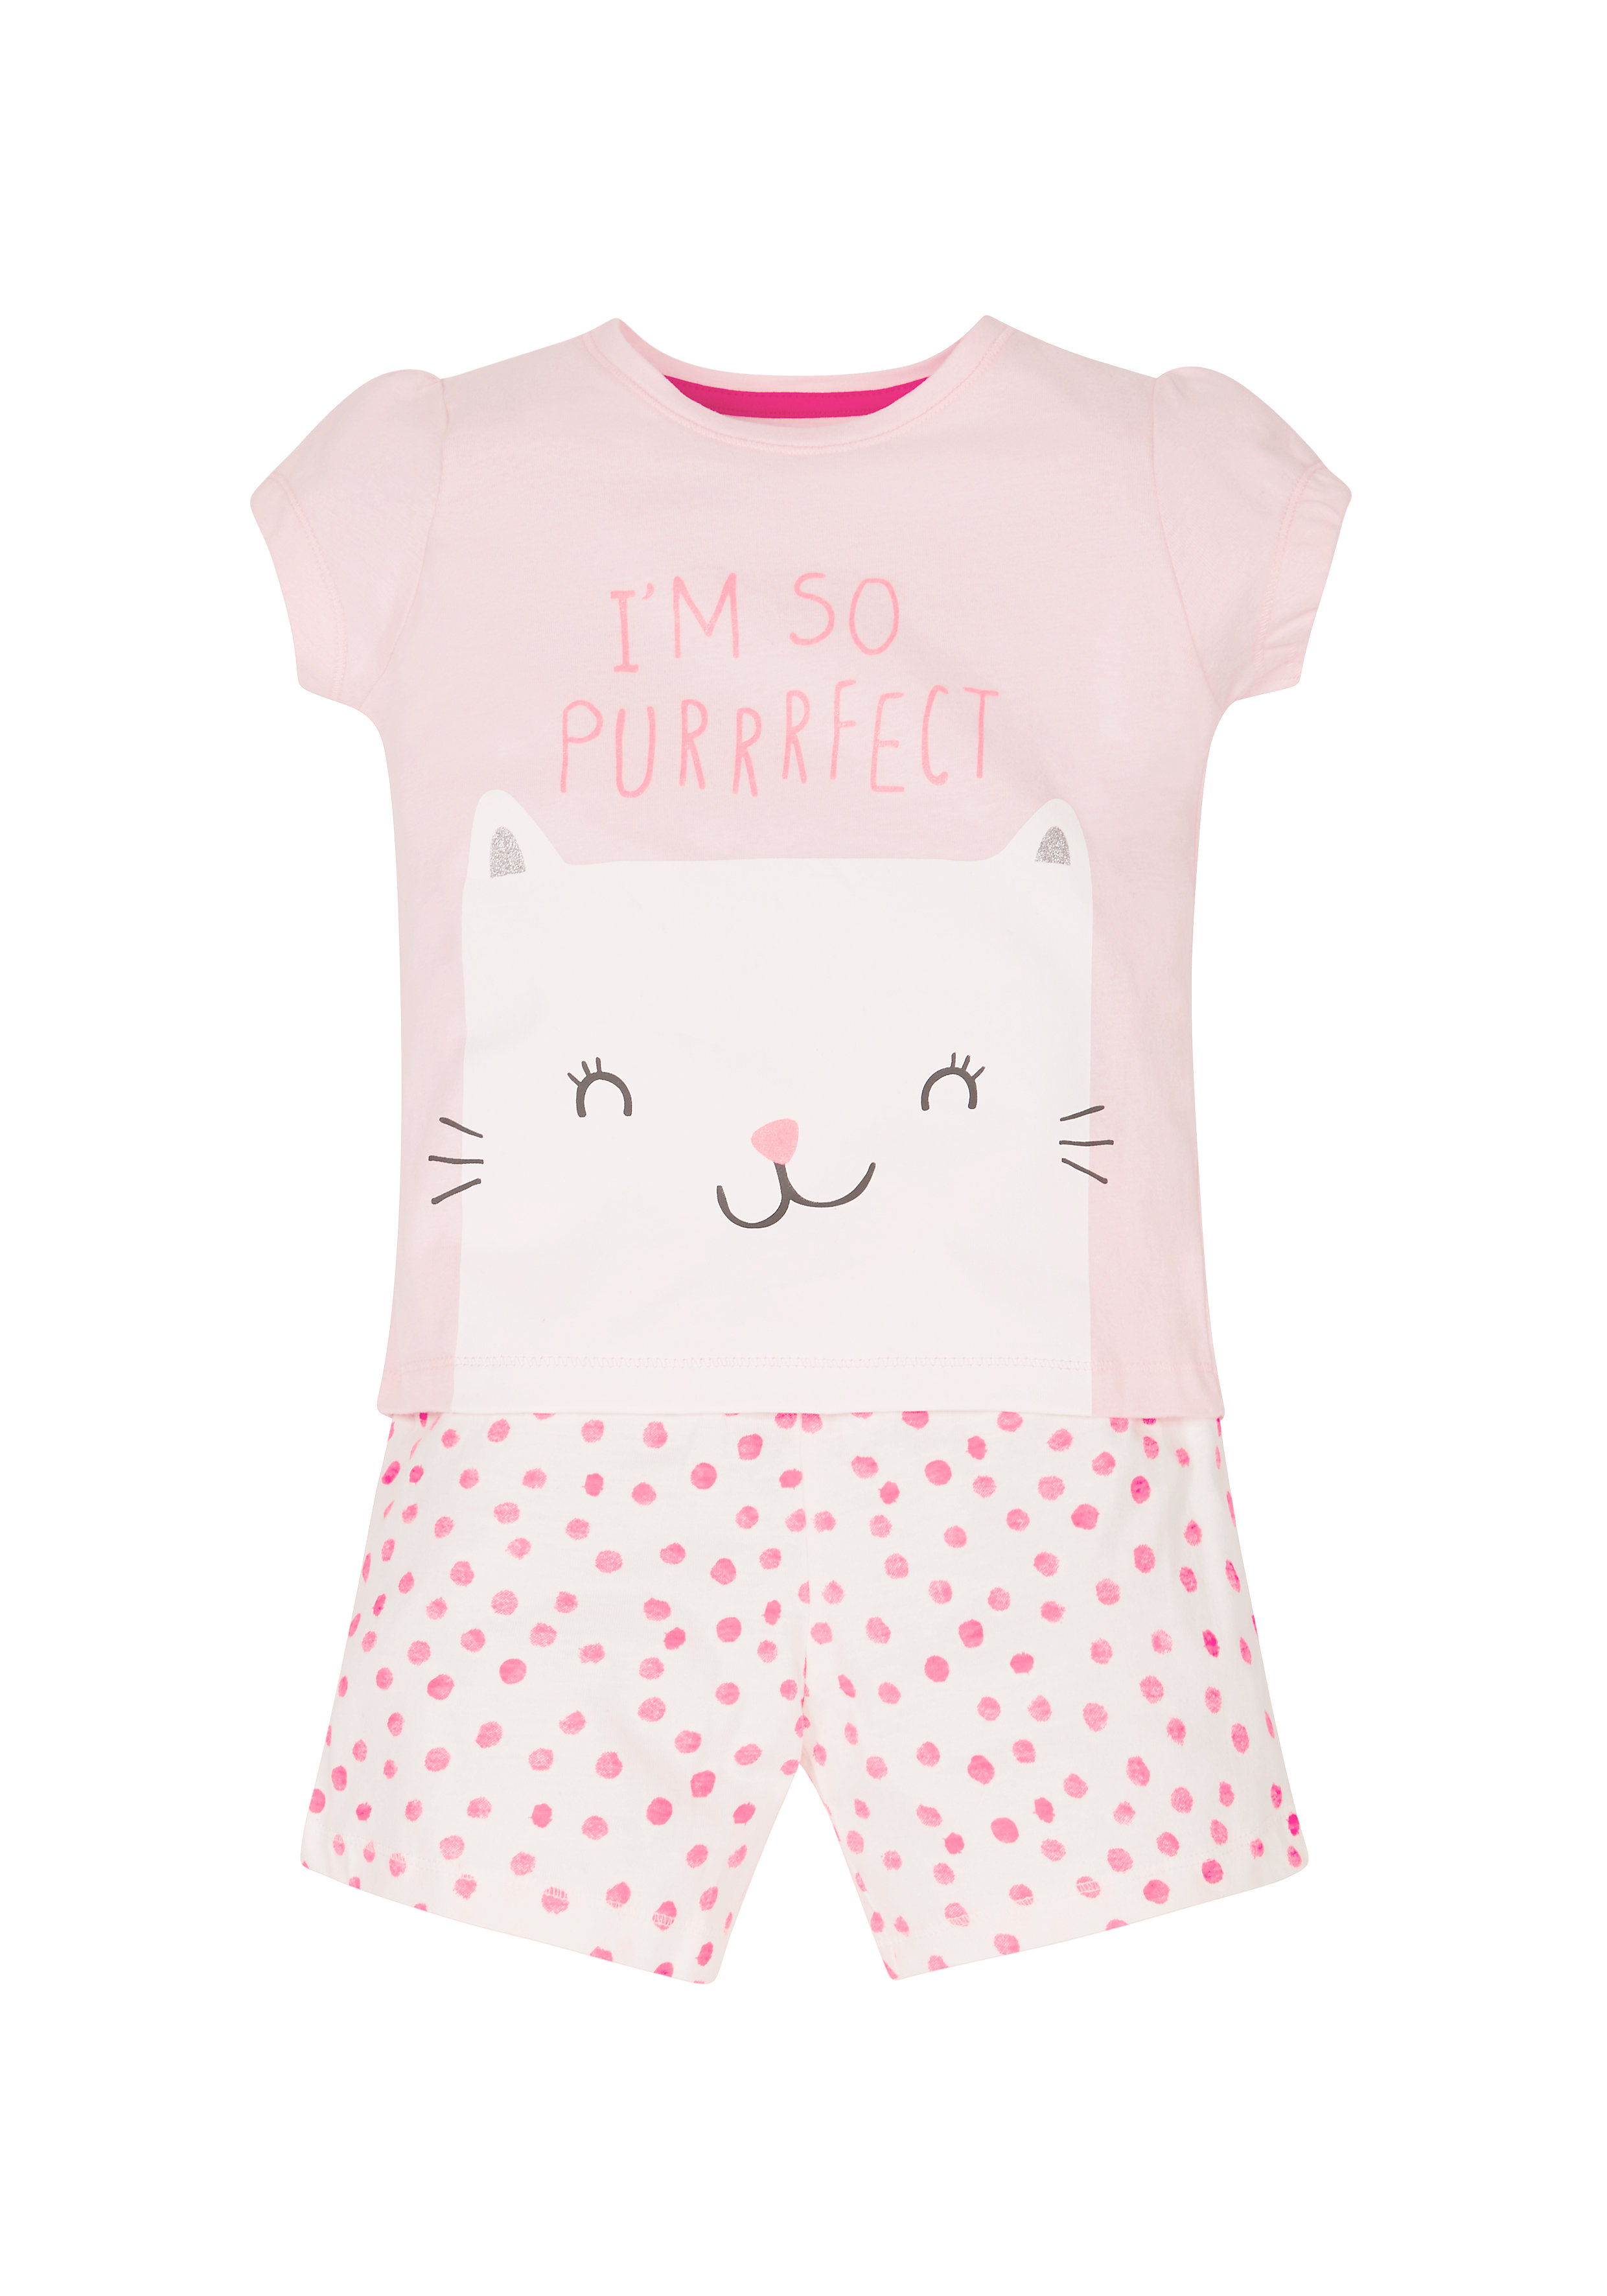 Mothercare | Girls I'M So Purrfect Shortie Pyjamas  - Pink